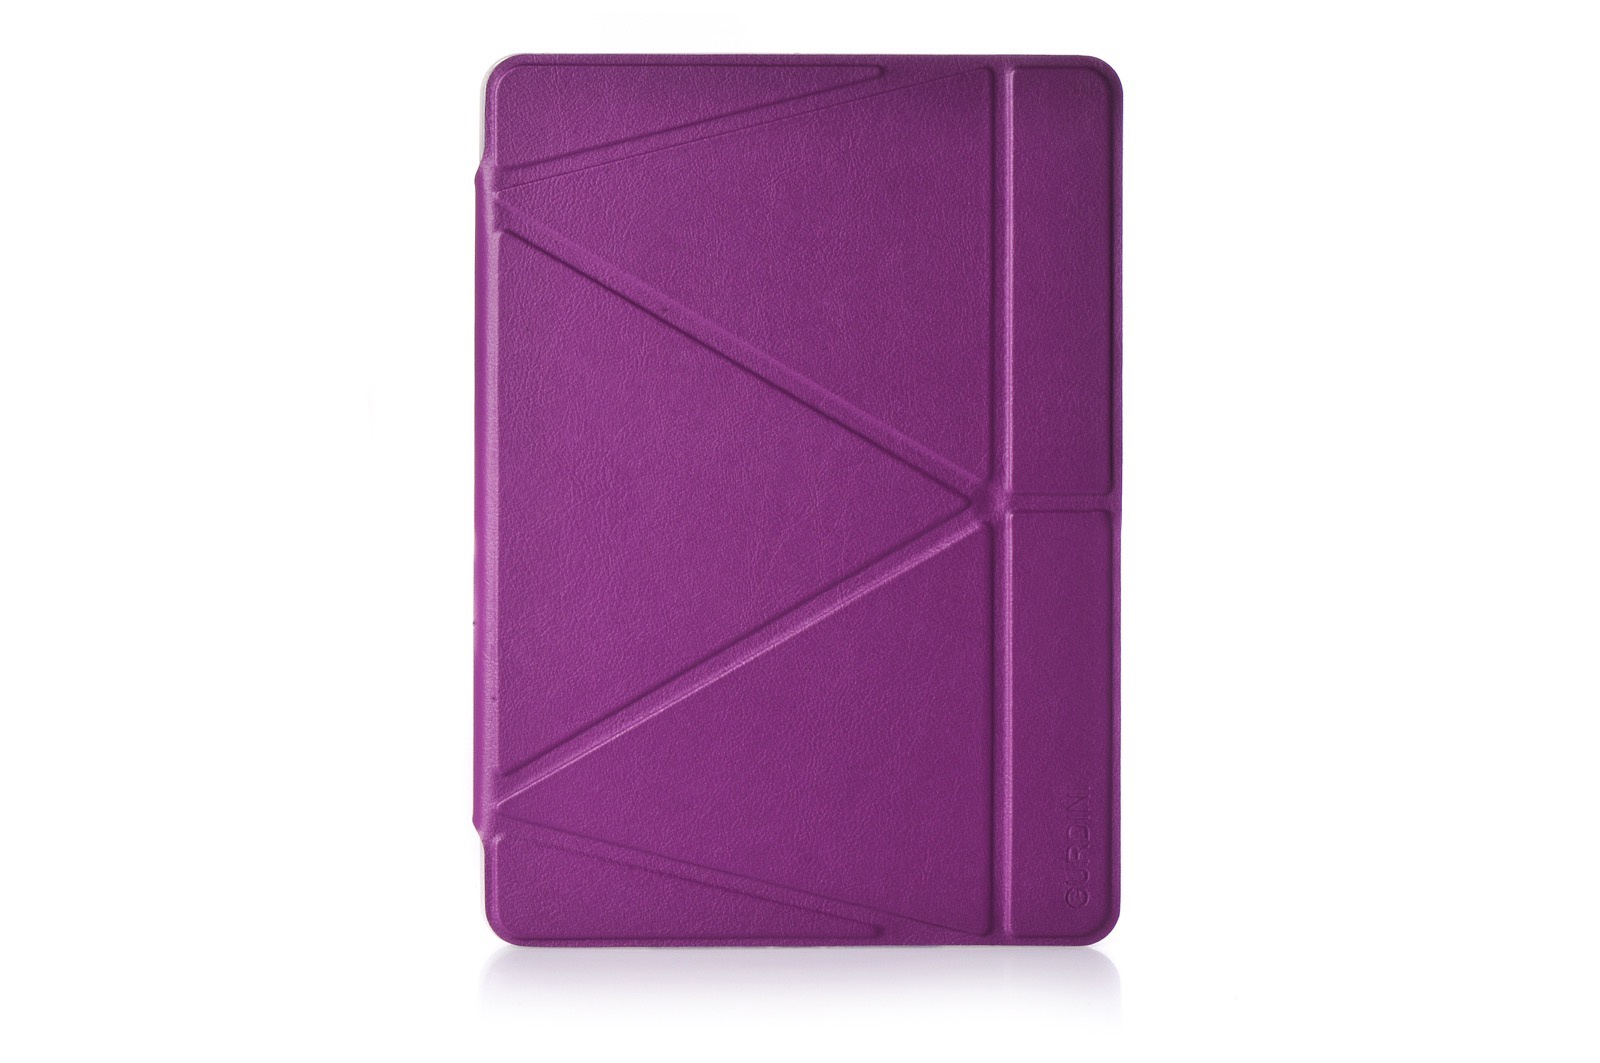 "Чехол для планшета Gurdini Lights Series 410336 для Apple Ipad mini 4 7.9"", 410336, фиолетовый"